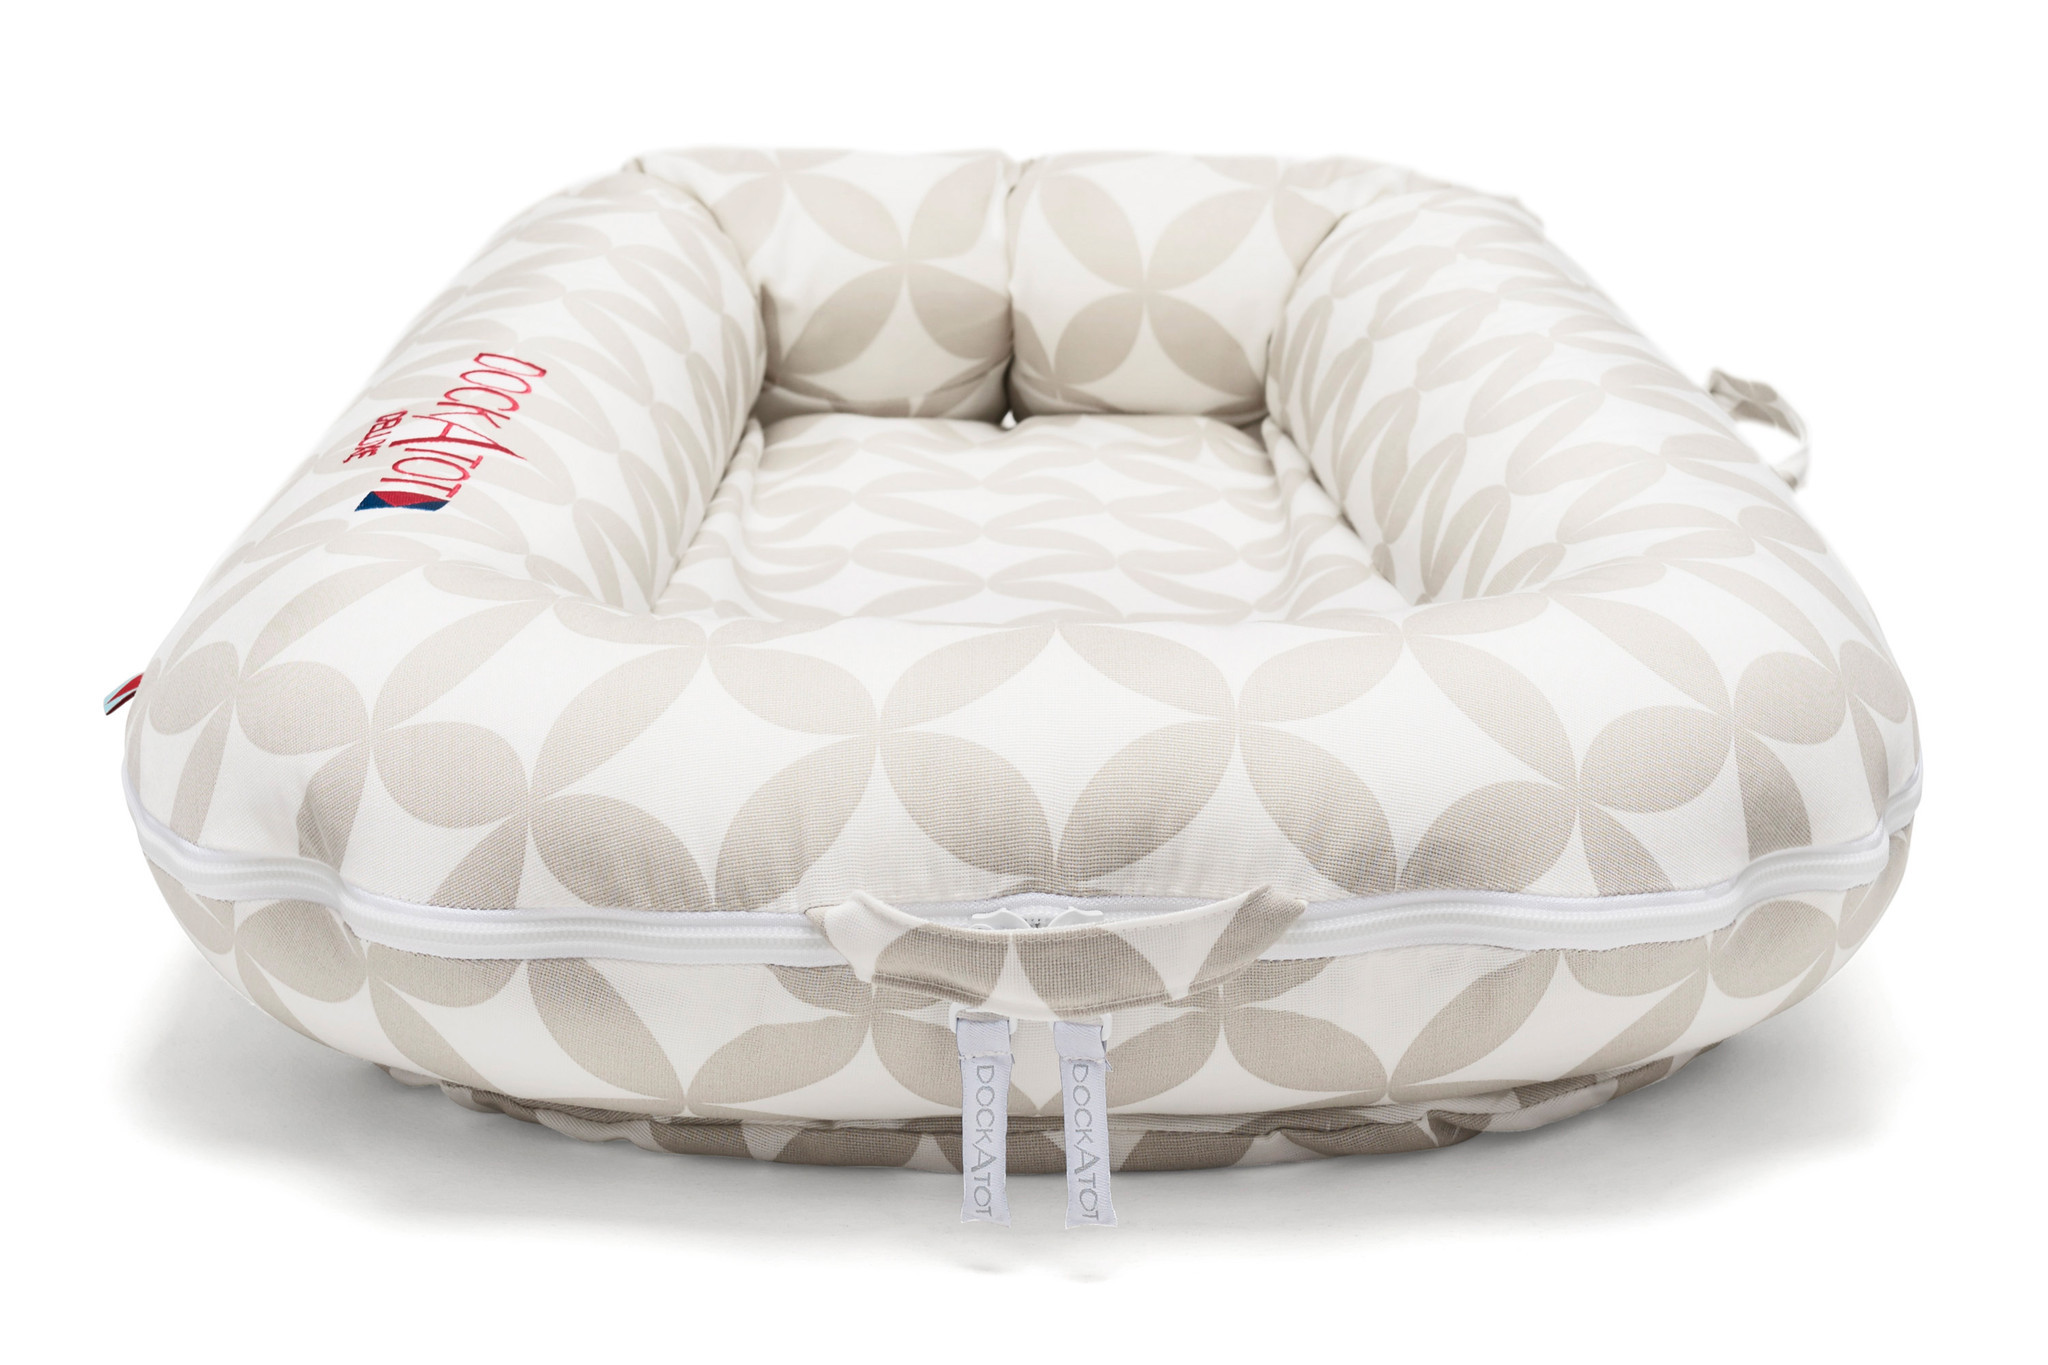 Dockatot Deluxe Dream Weaver Baby Lounger Pillows